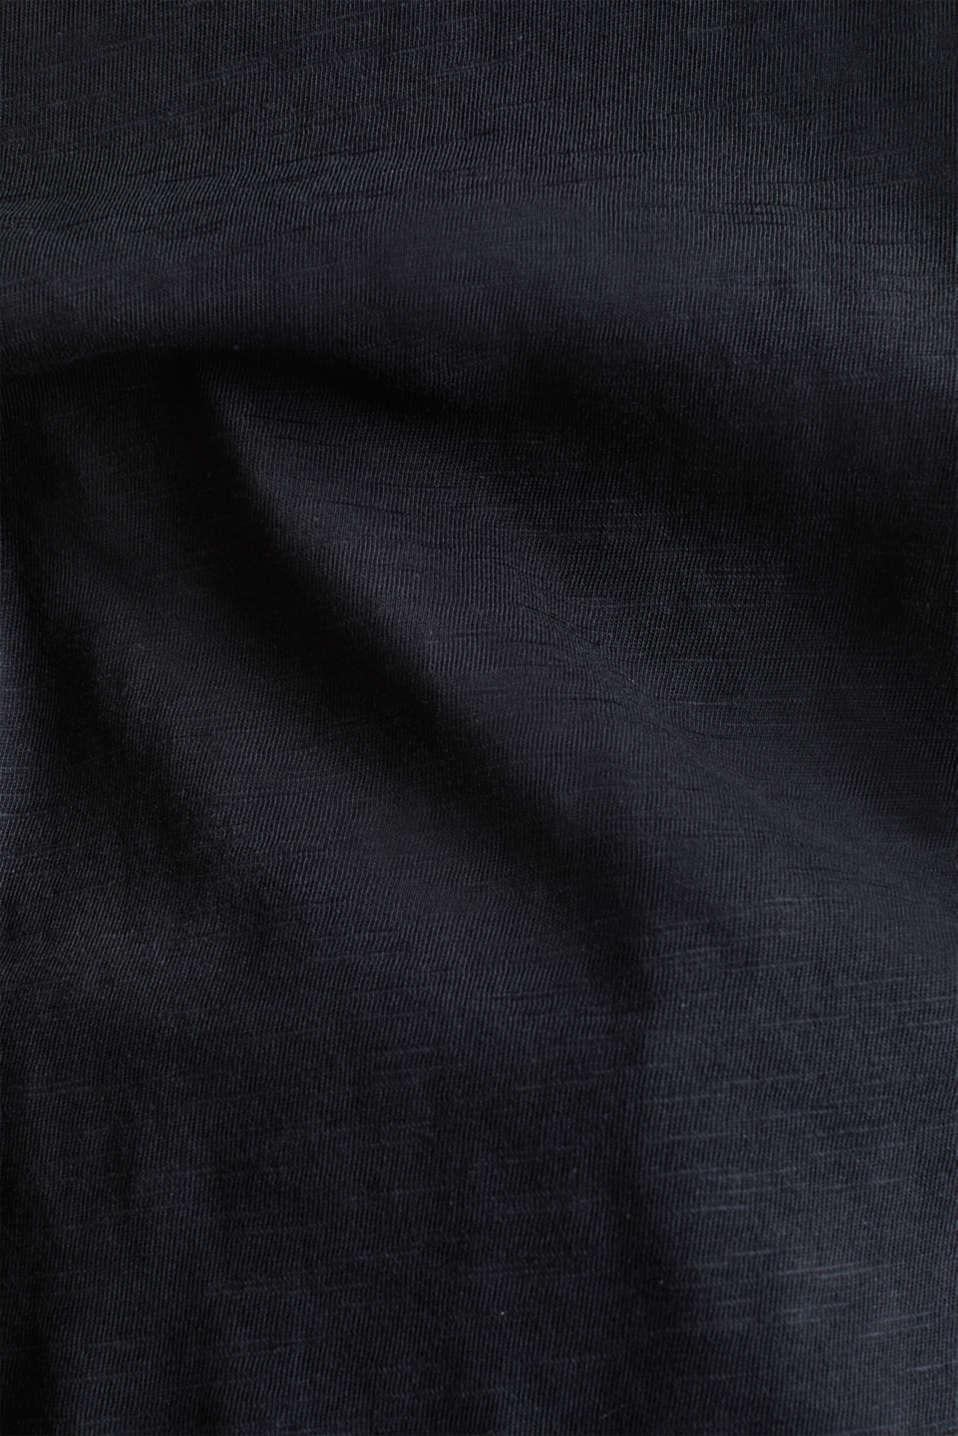 Slub top with 3/4-length sleeves, 100% cotton, BLACK, detail image number 3